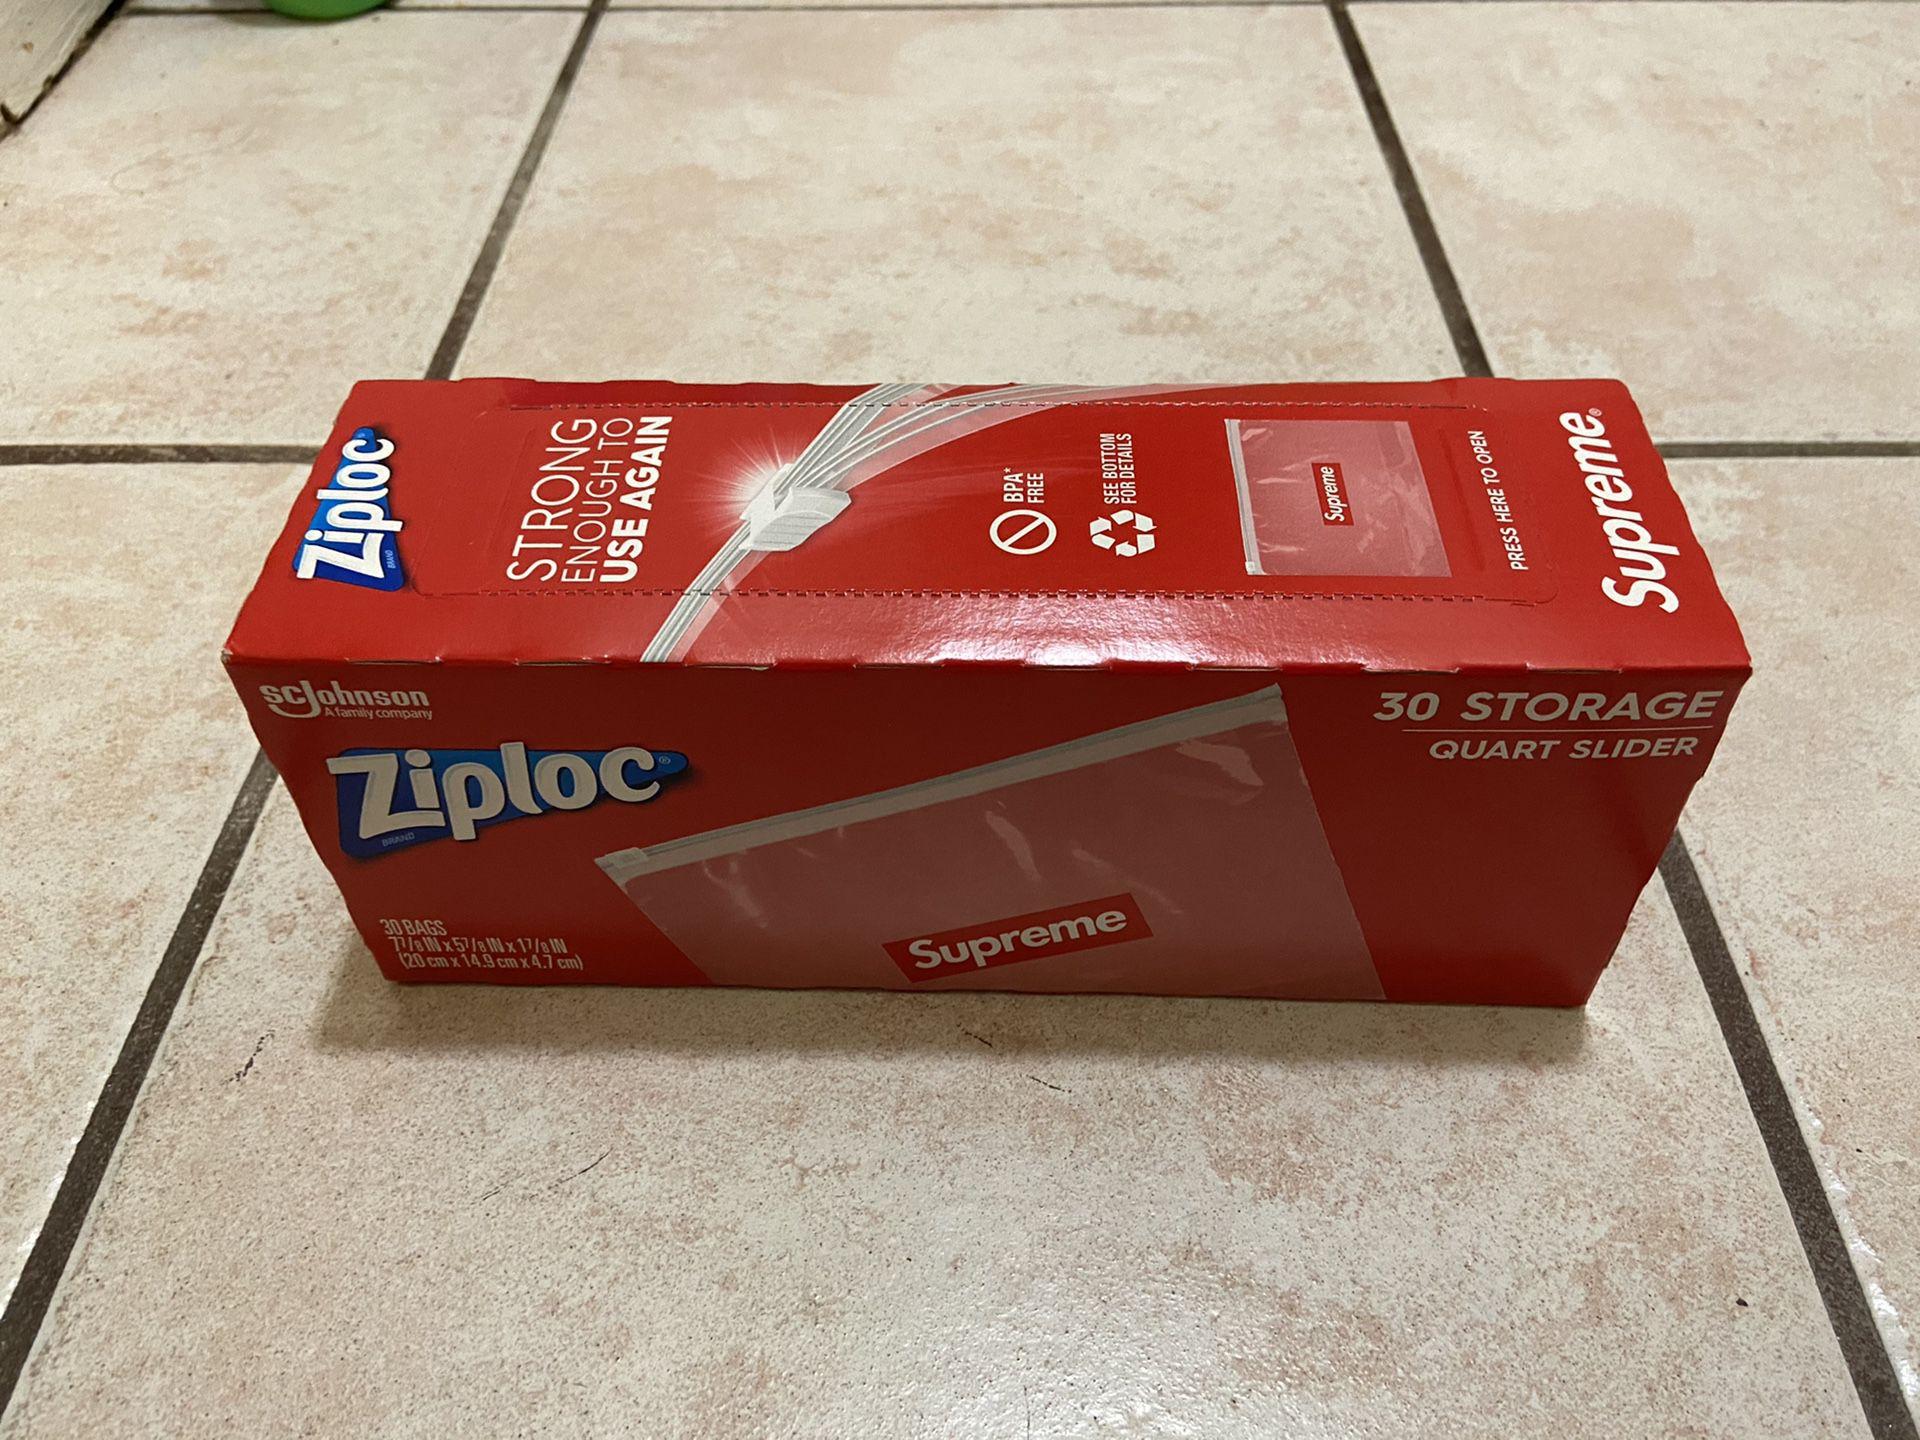 Supreme x ziplock